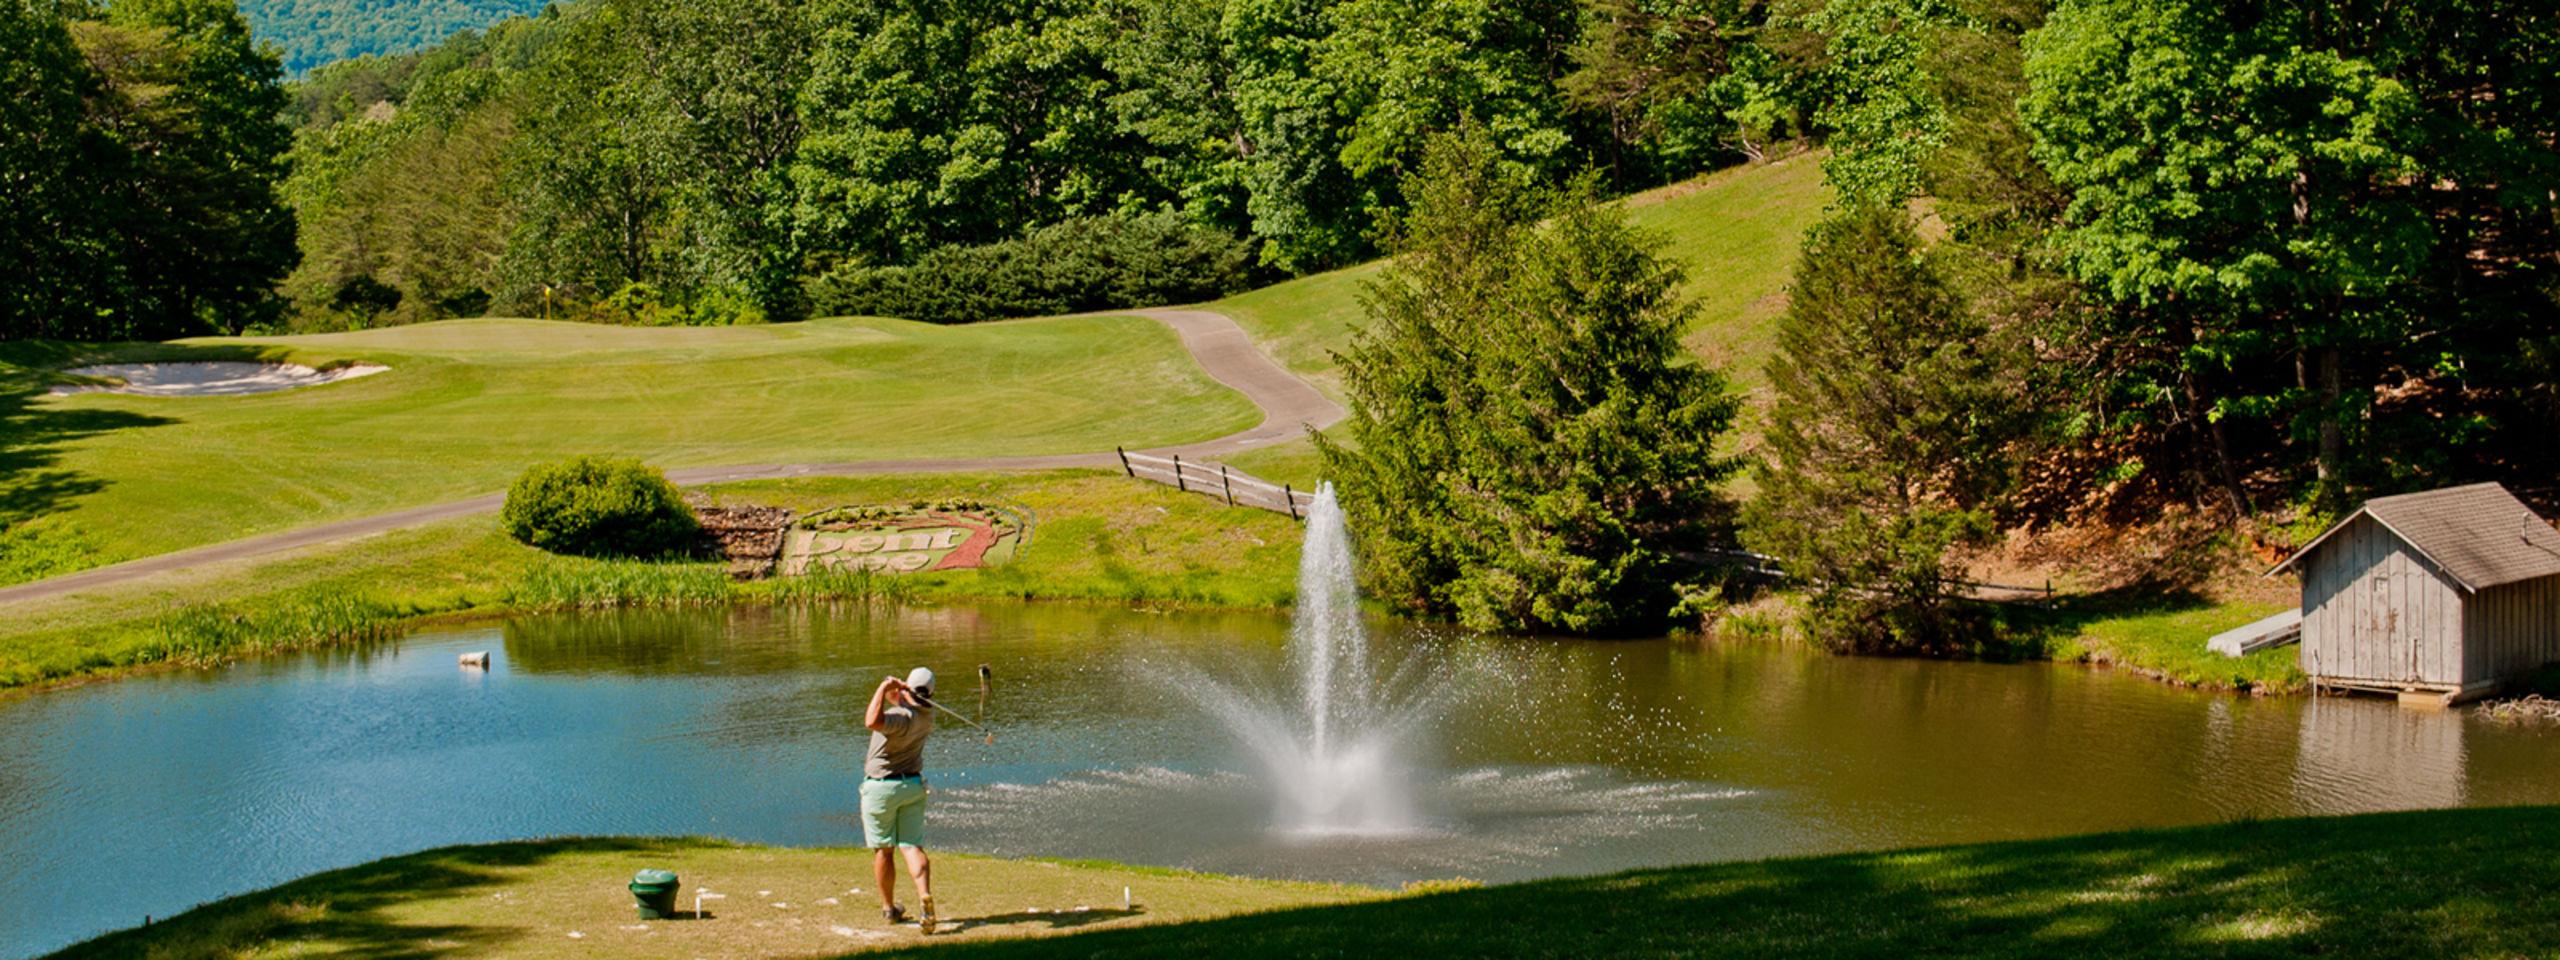 18 Holes Championship Golf